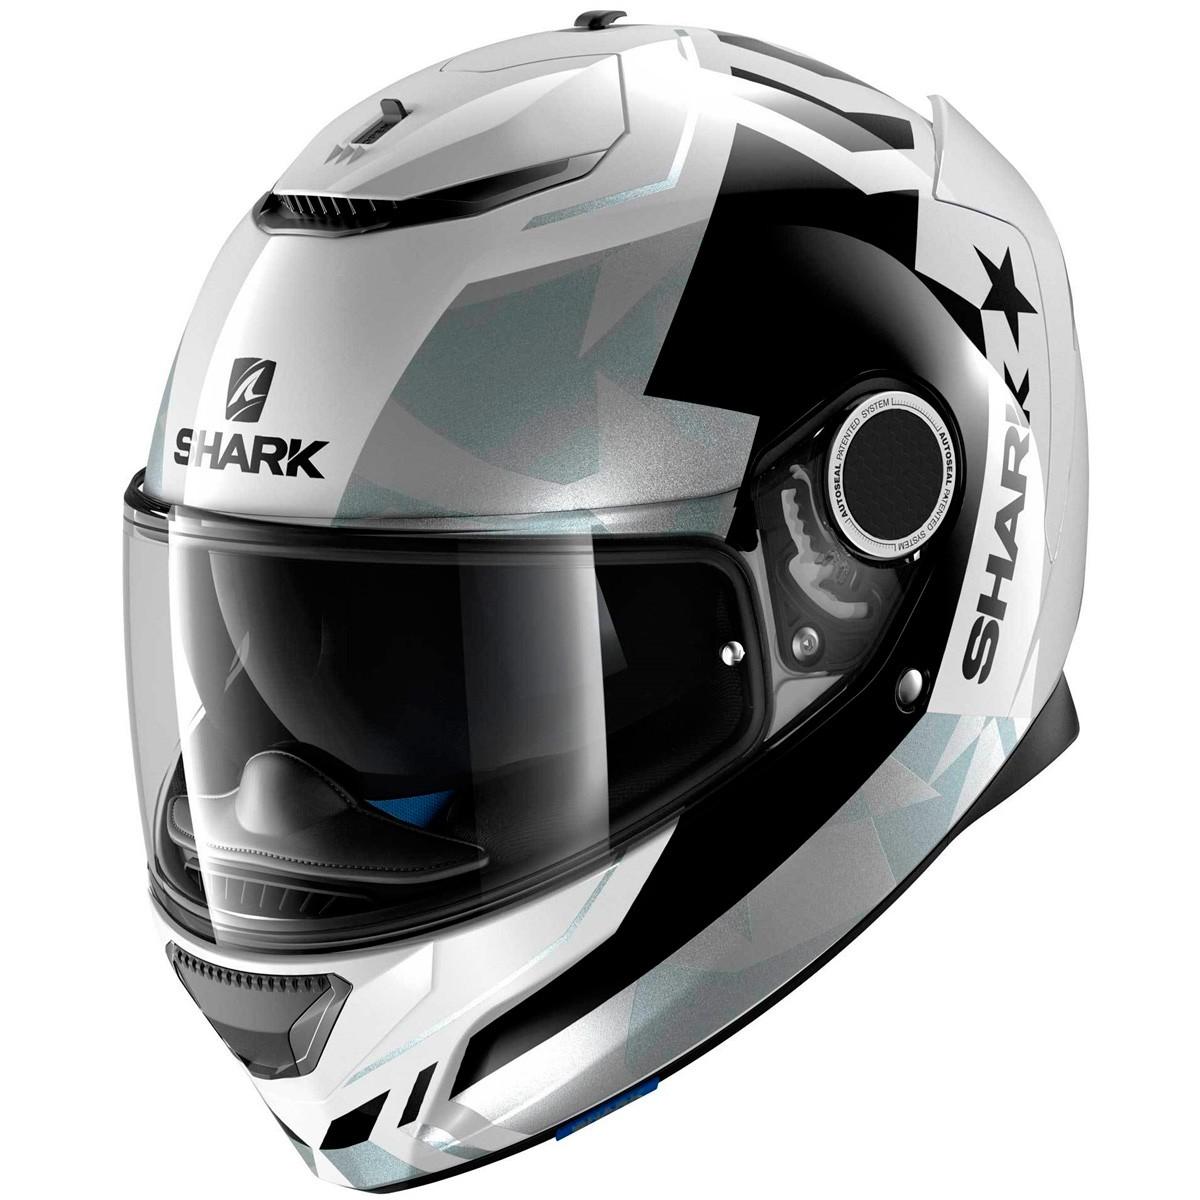 Capacete Shark Spartan Droze SS P WKS  - Nova Suzuki Motos e Acessórios